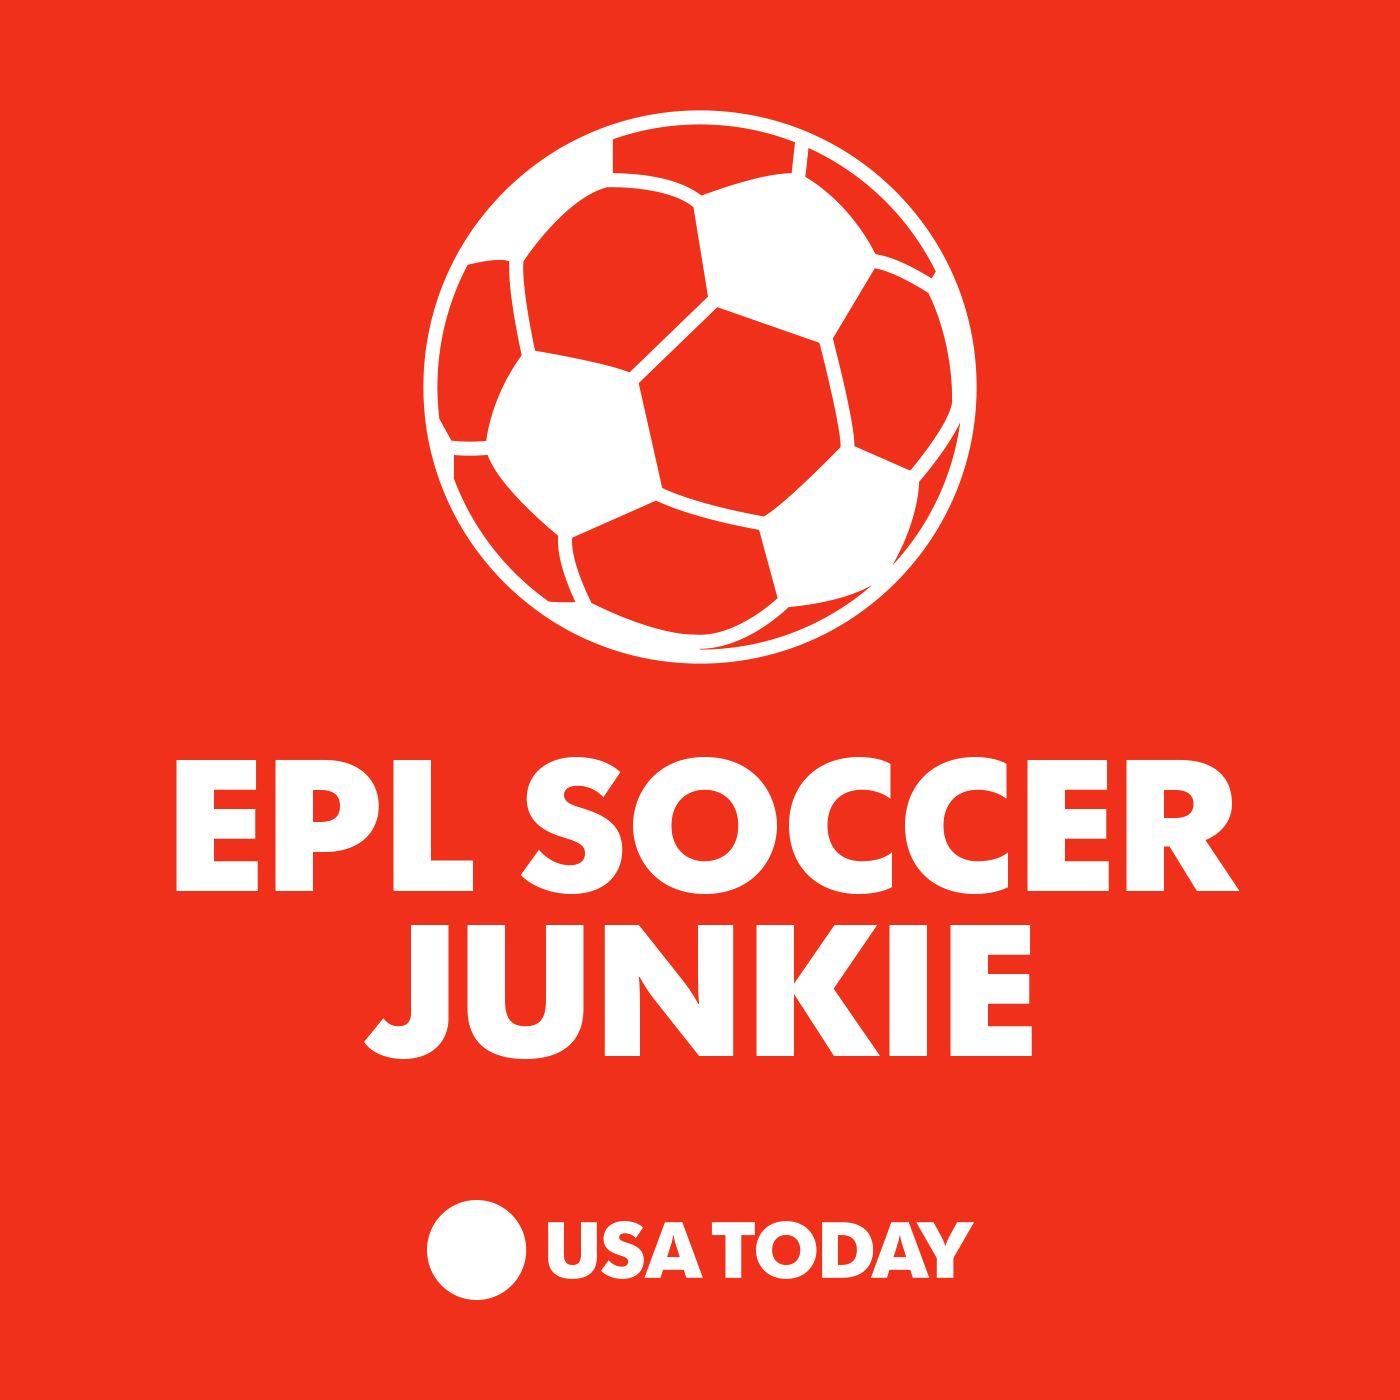 EPL Soccer Junkie